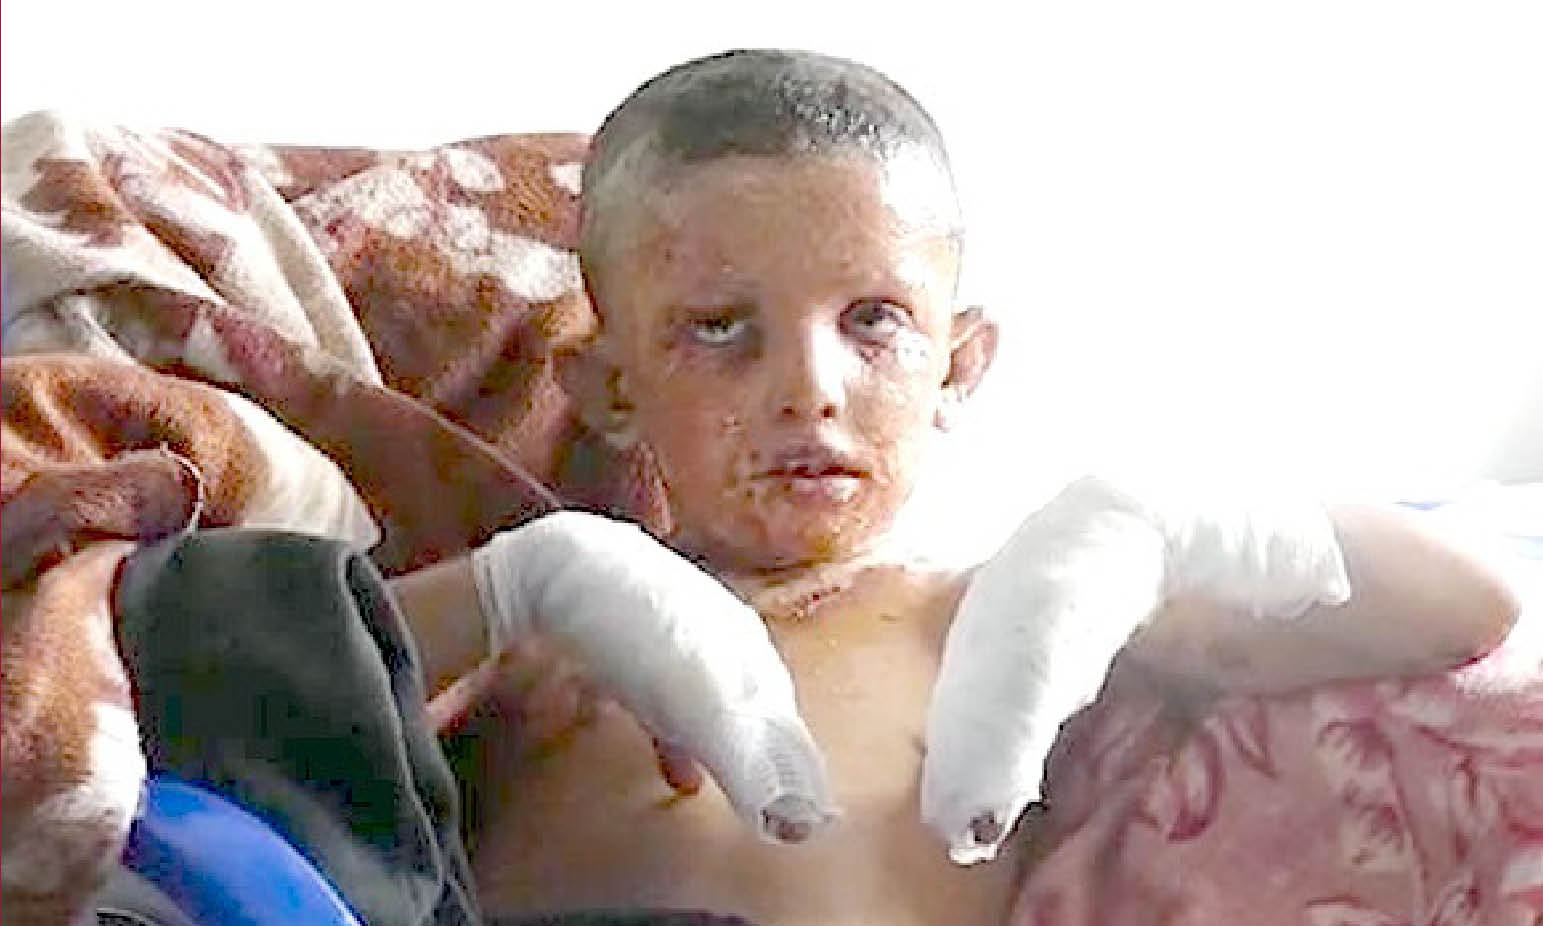 Erdogan's war crimes: the truce broken by Turks with 18 dead. White phosphorus against children